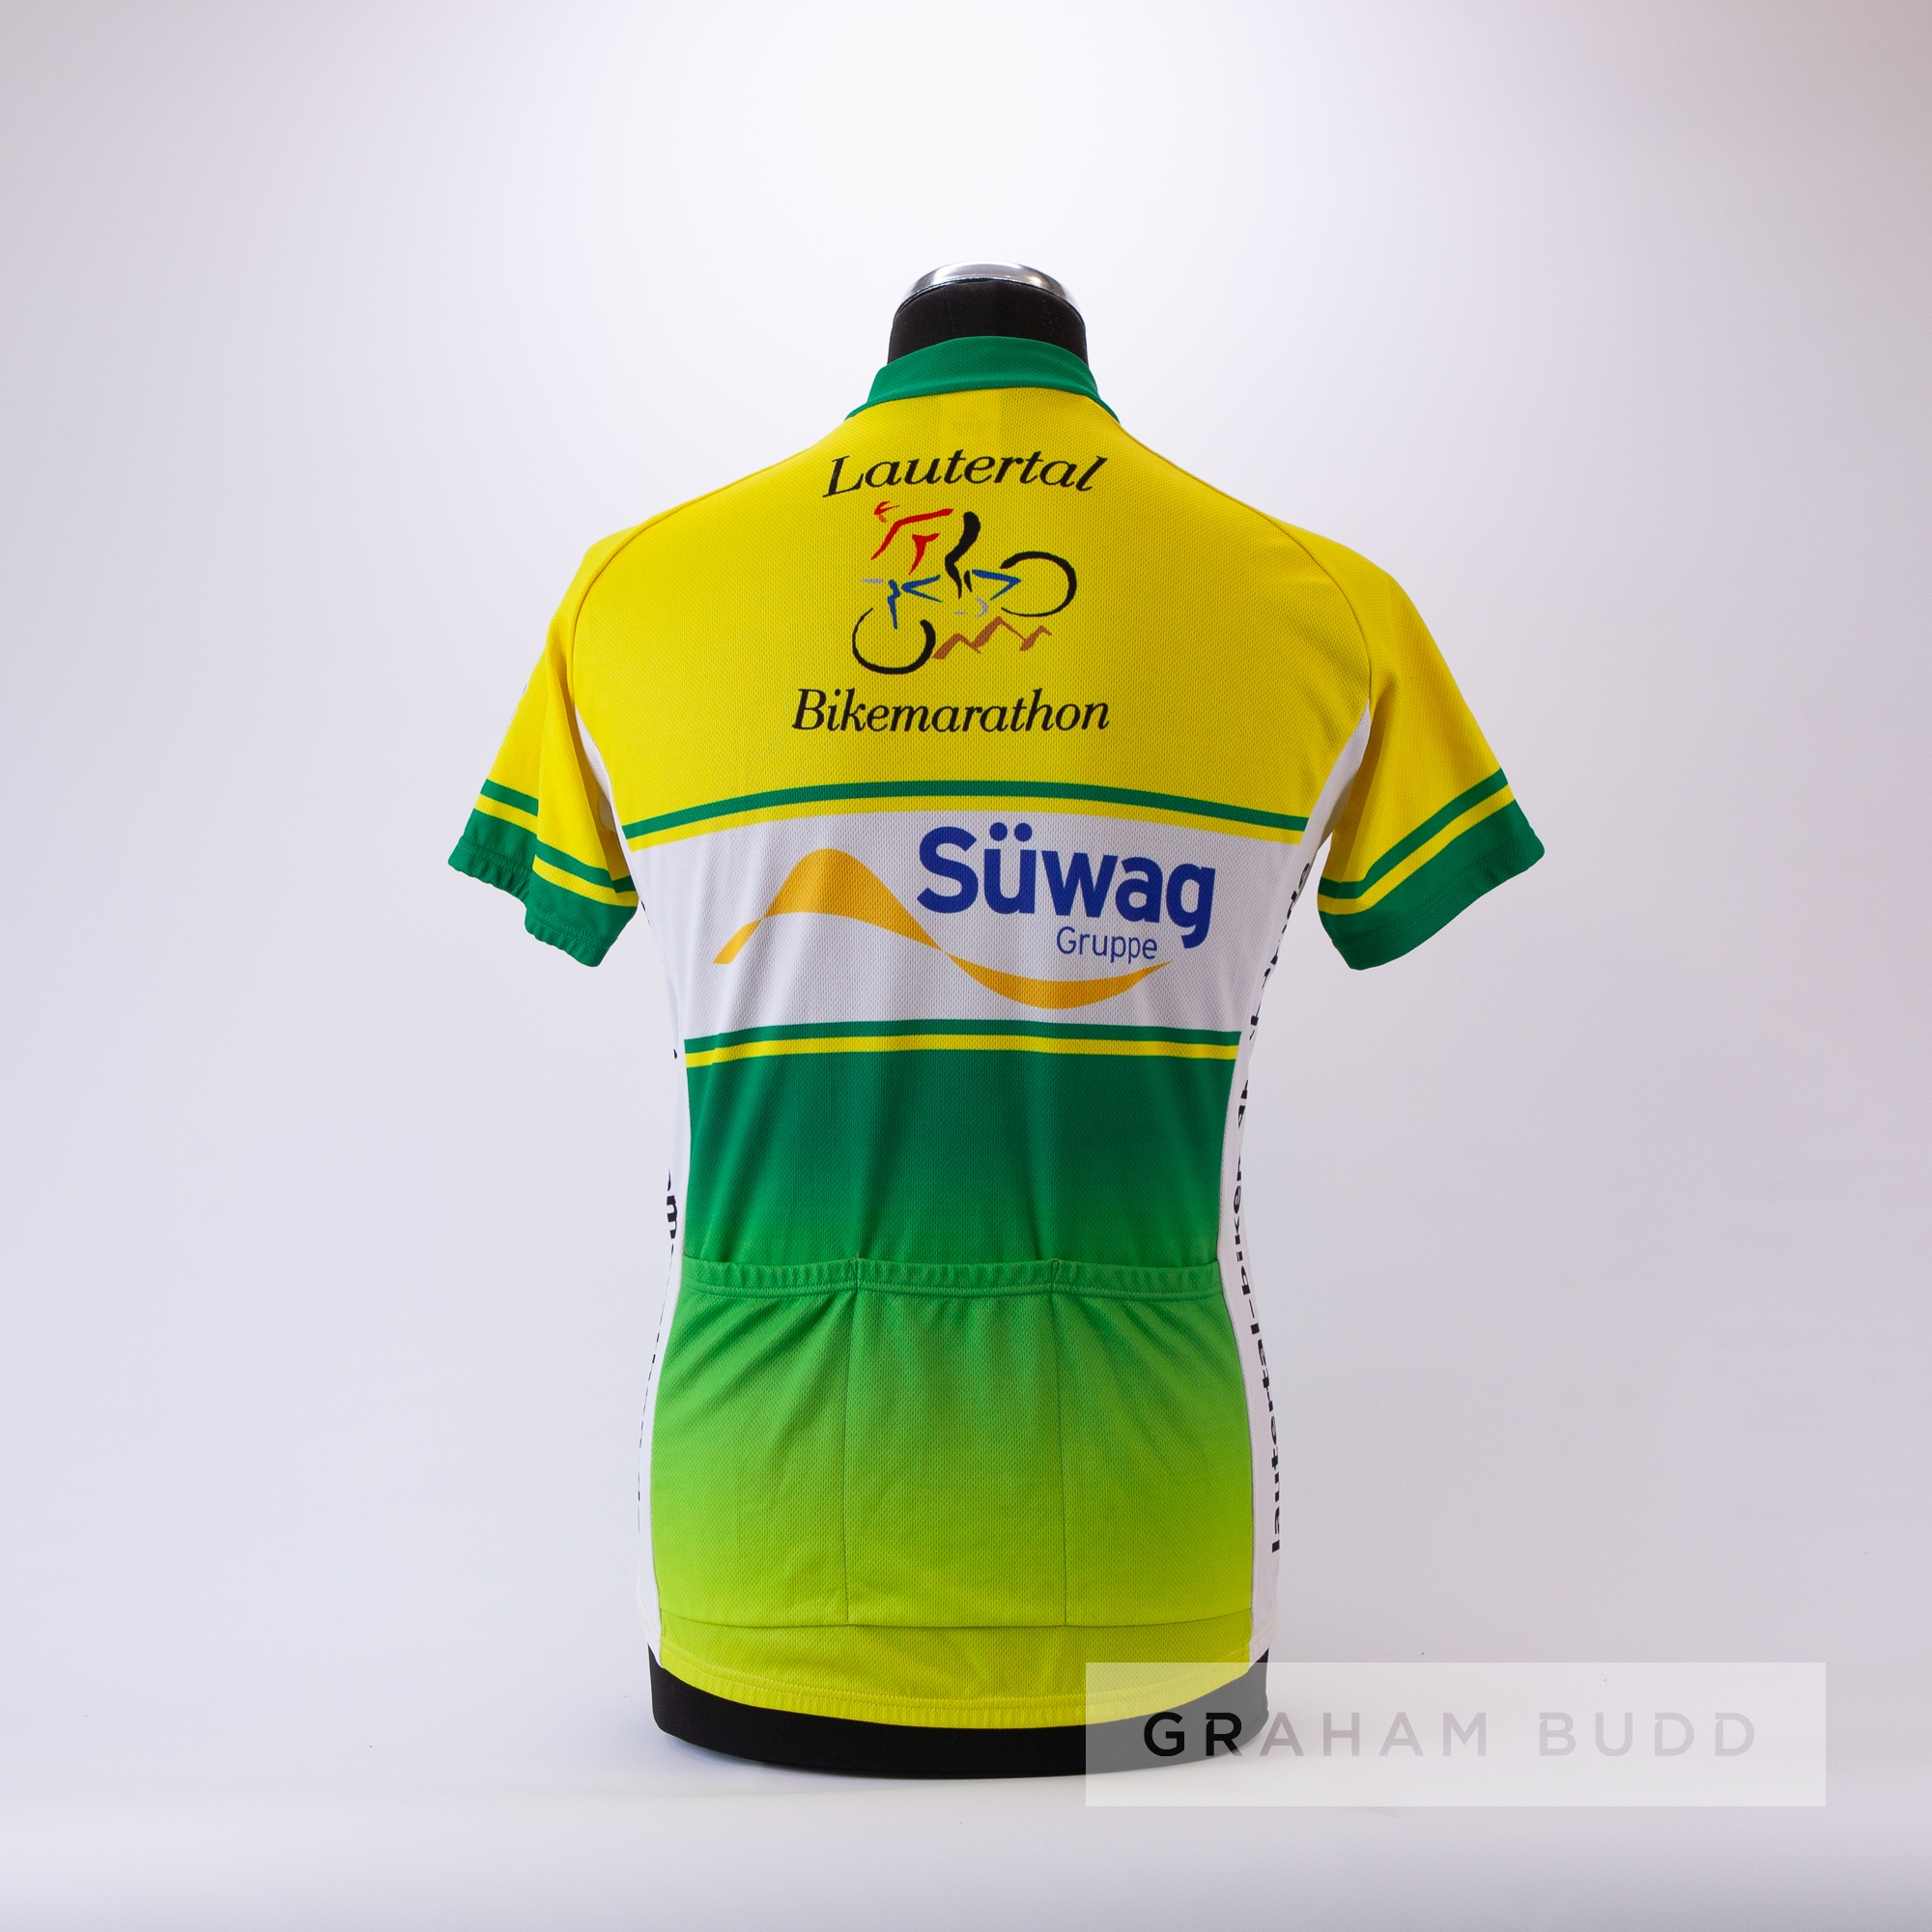 2008 green, yellow and white Maish Lautertal Spiegelberg marathon Cycling race jersey, scarce, - Image 4 of 4